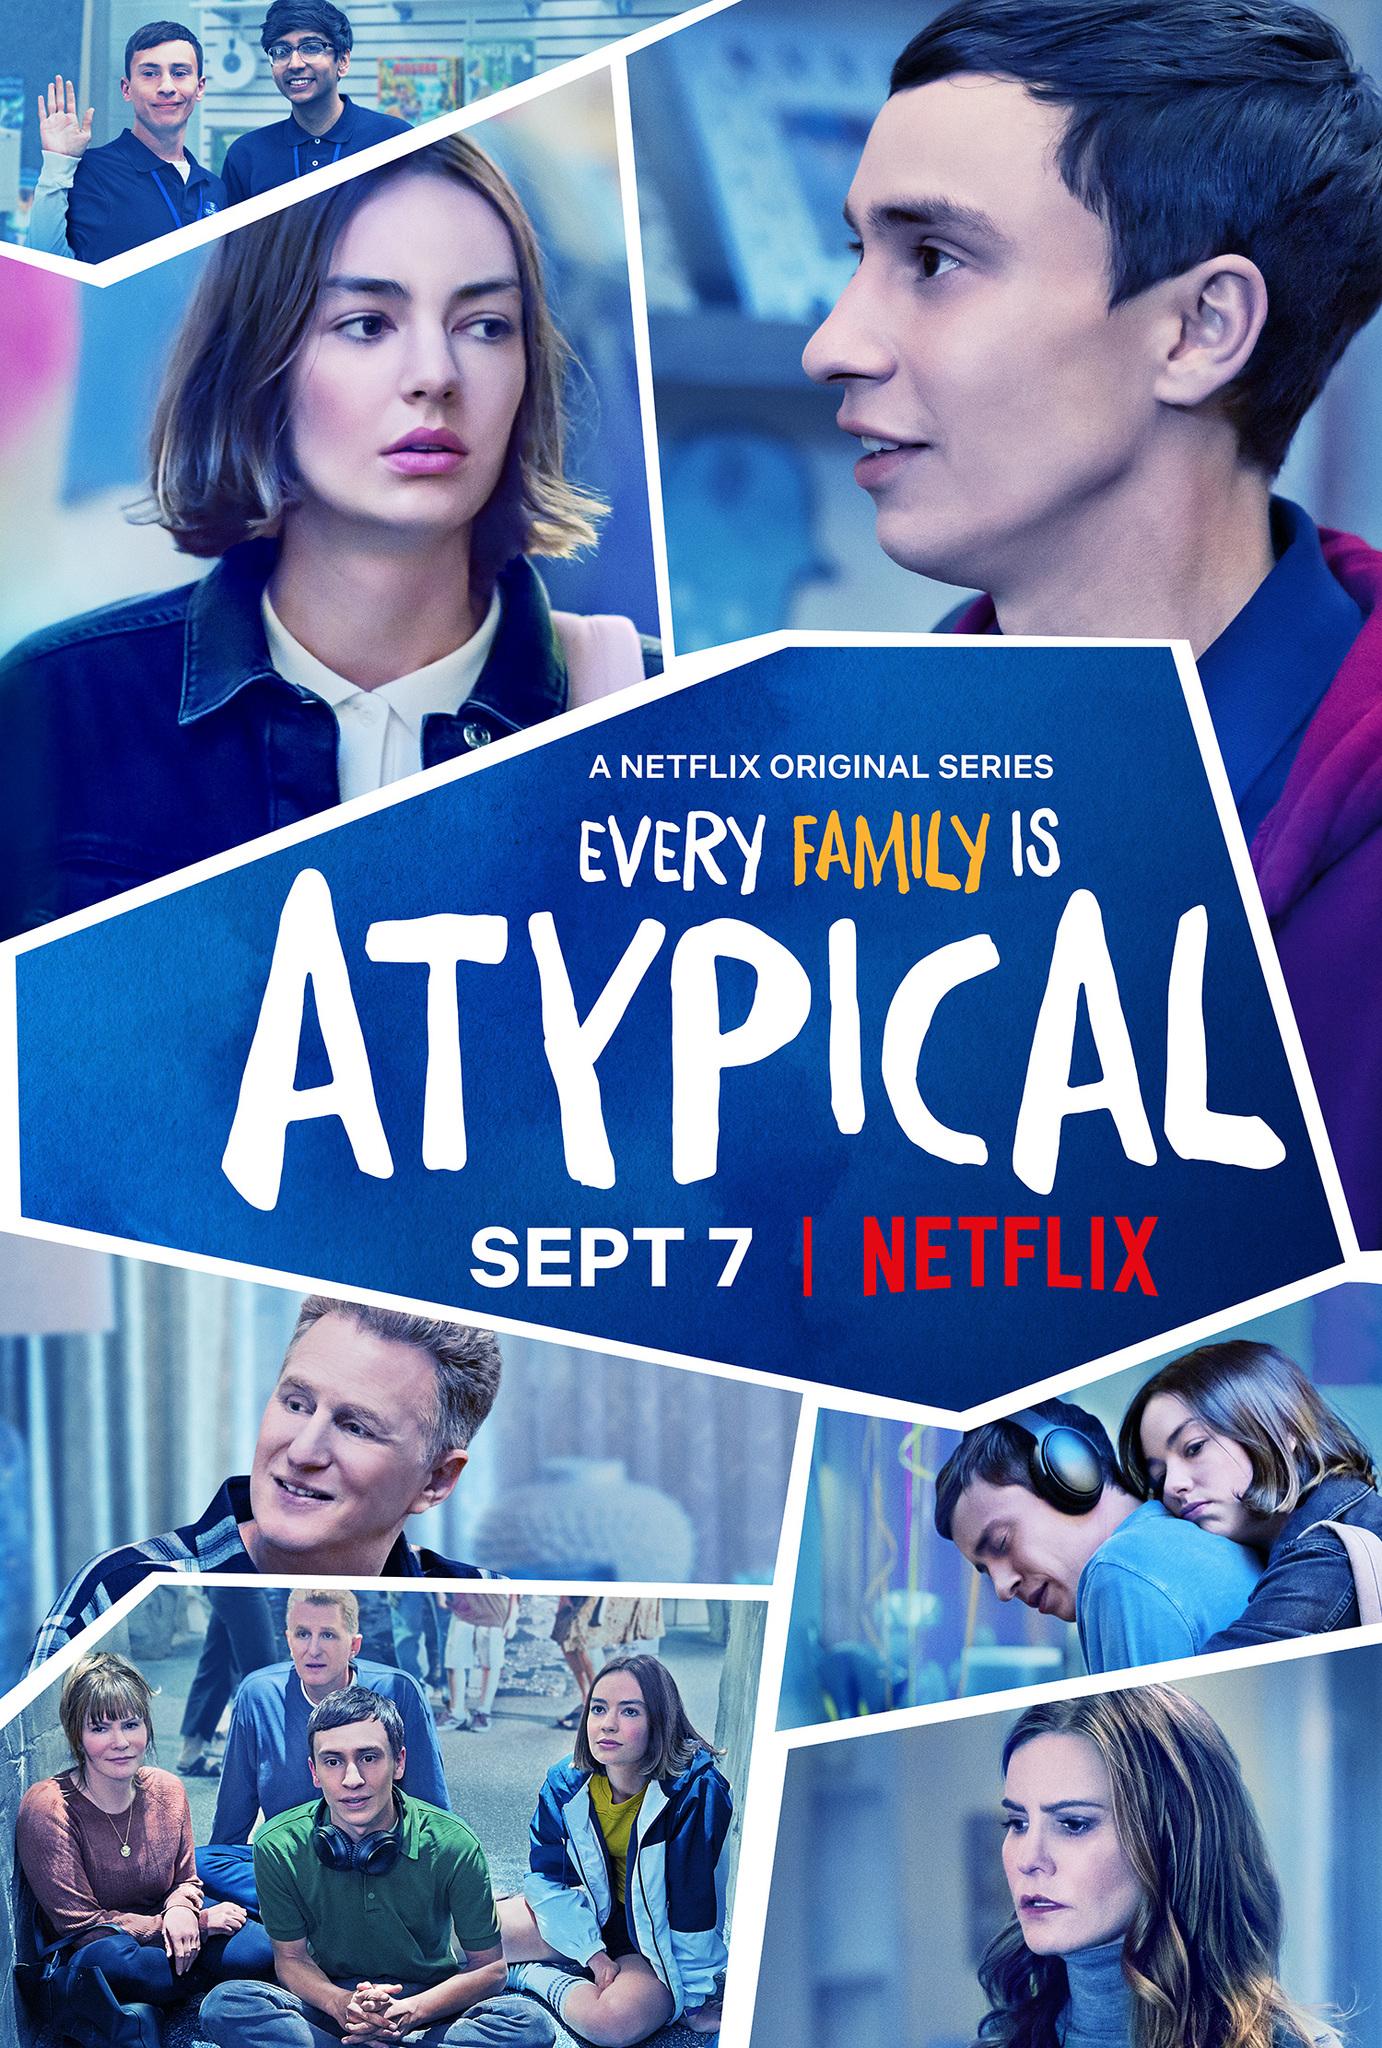 Atypical (TV Series 2017– ) - IMDb